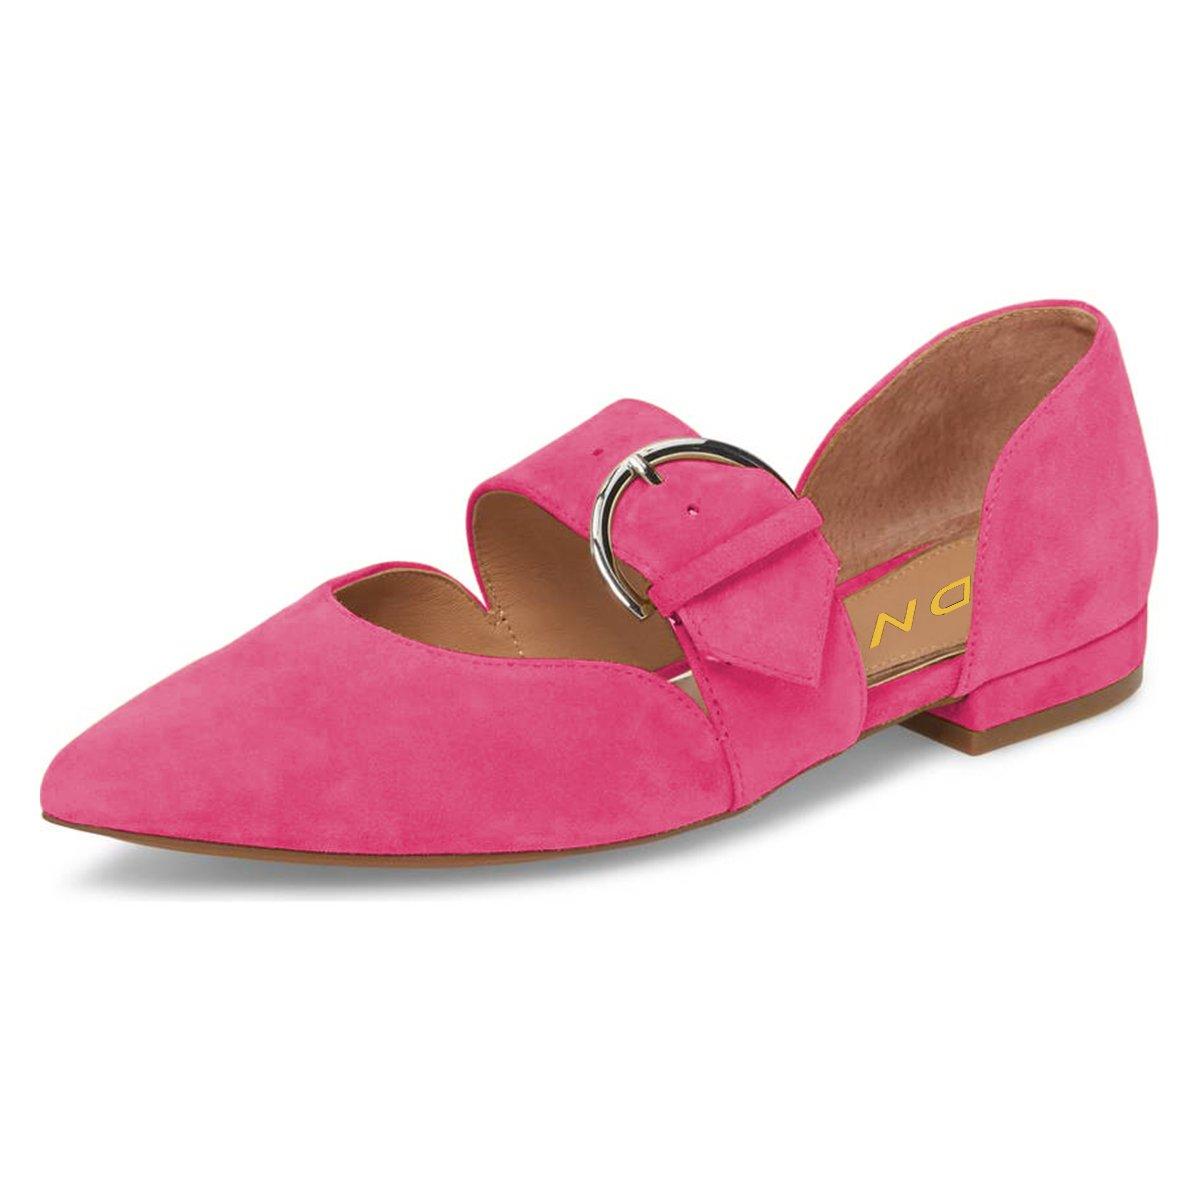 YDN Women's Pointed Toe Mary Jane Flats Slip On D'Orsay Pumps Low Heels Office Shoes B07B4FCH95 5 B(M) US|Fuchsia